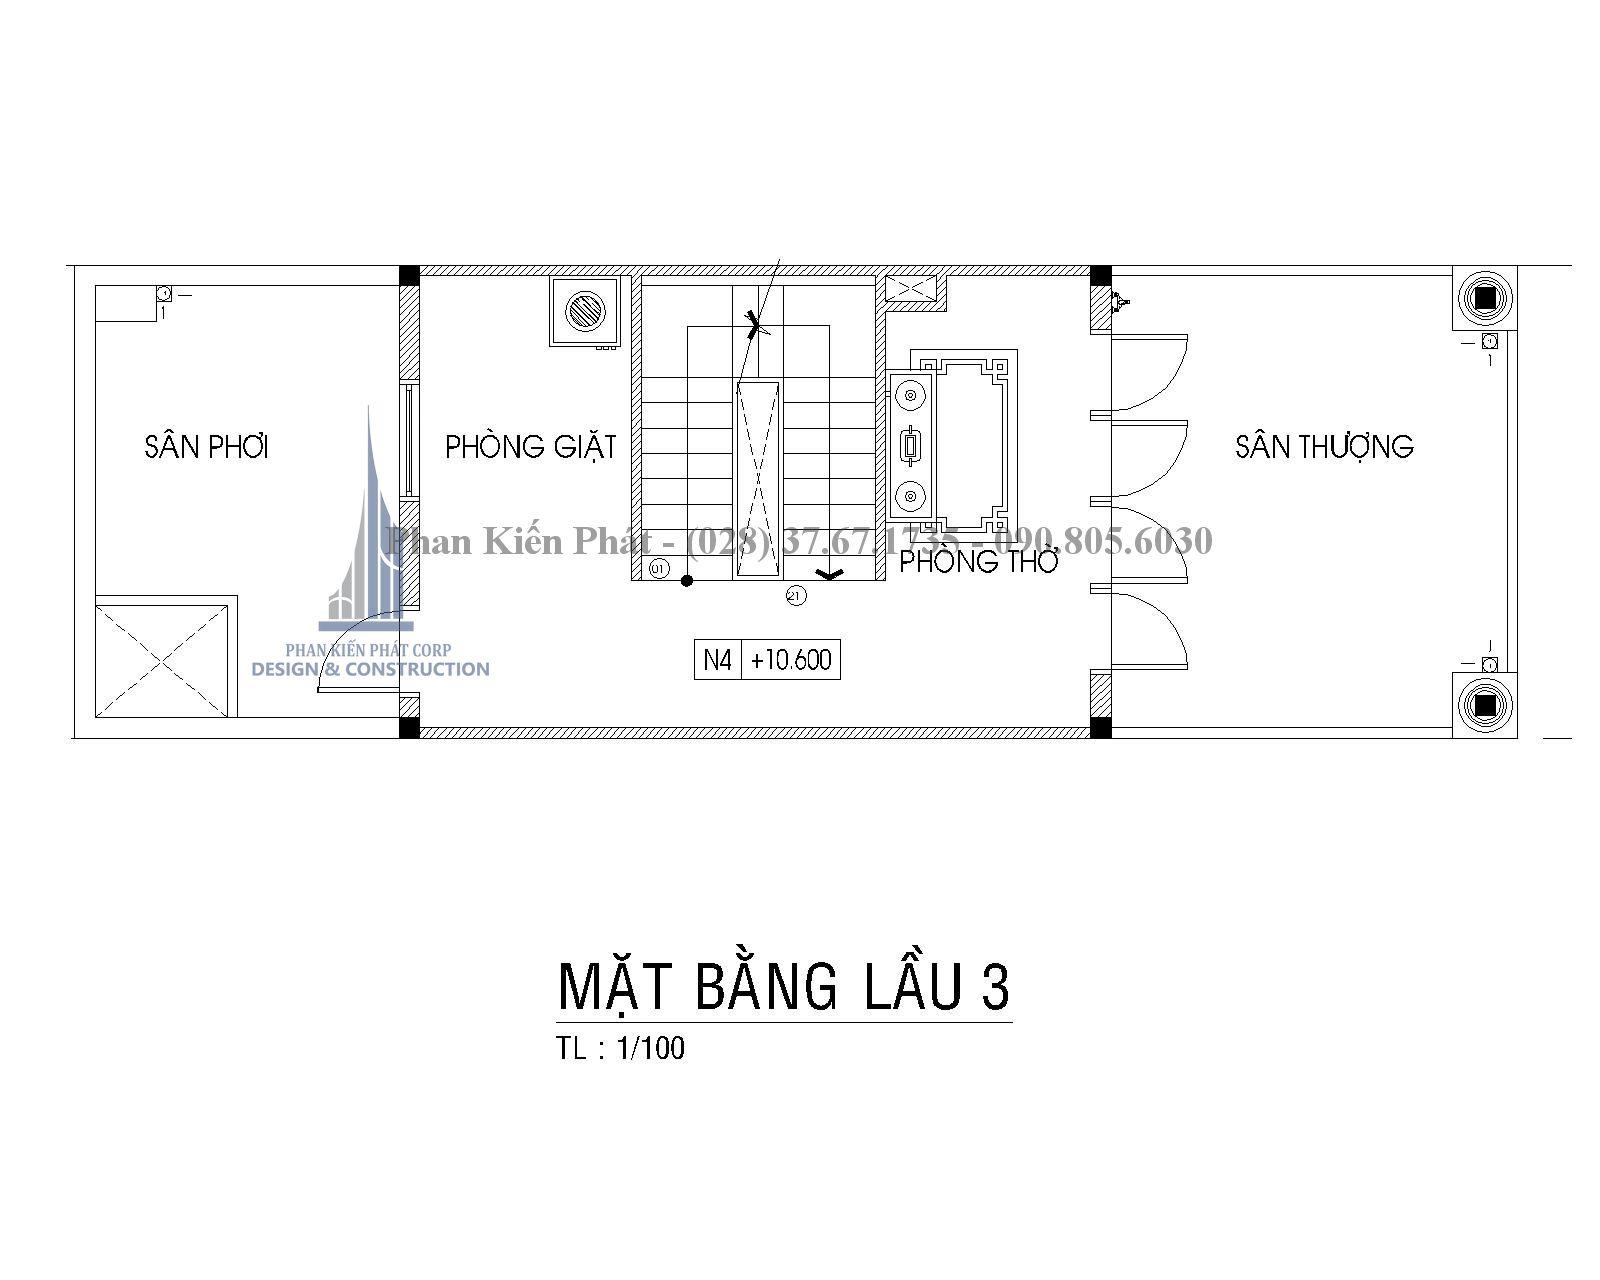 Mat Bang Lau 3 Nha Pho